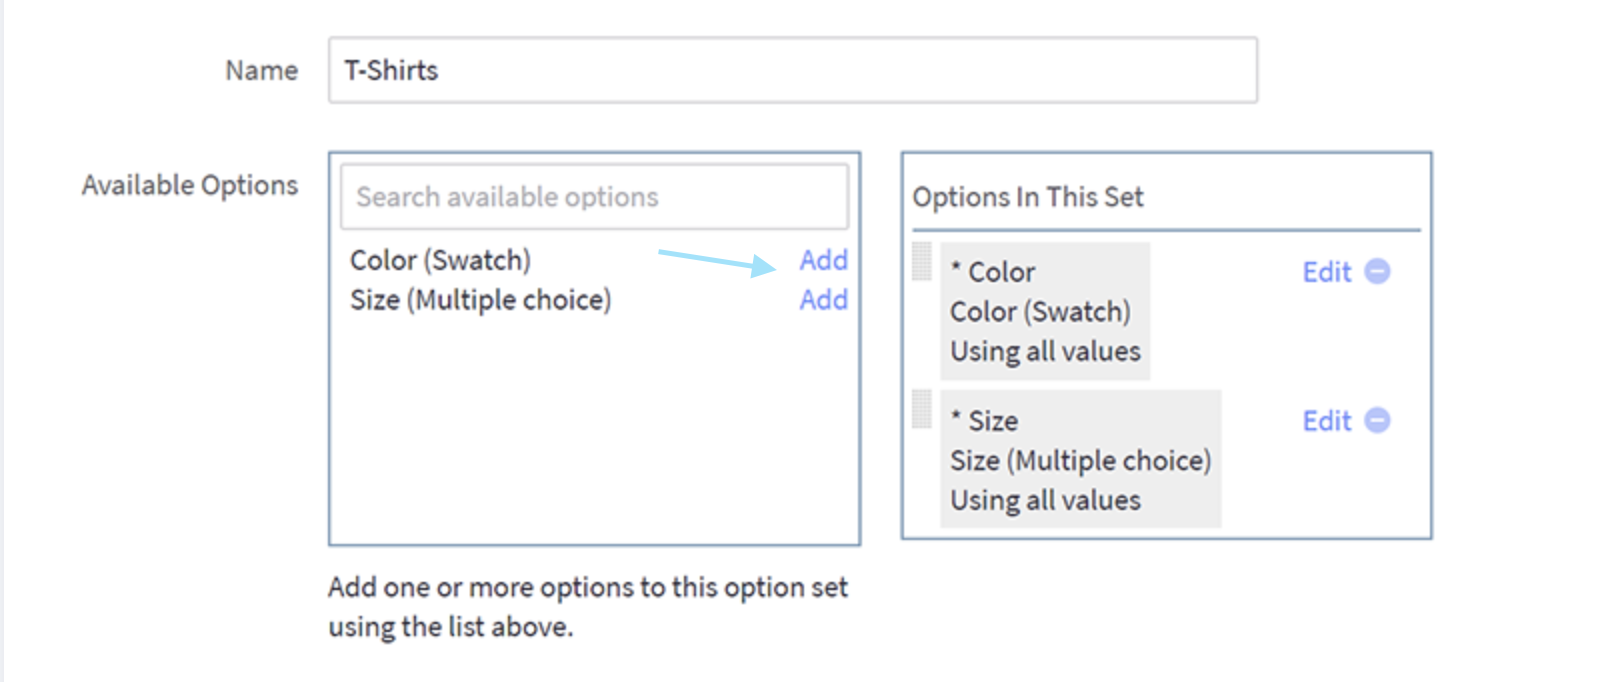 Create an Option set